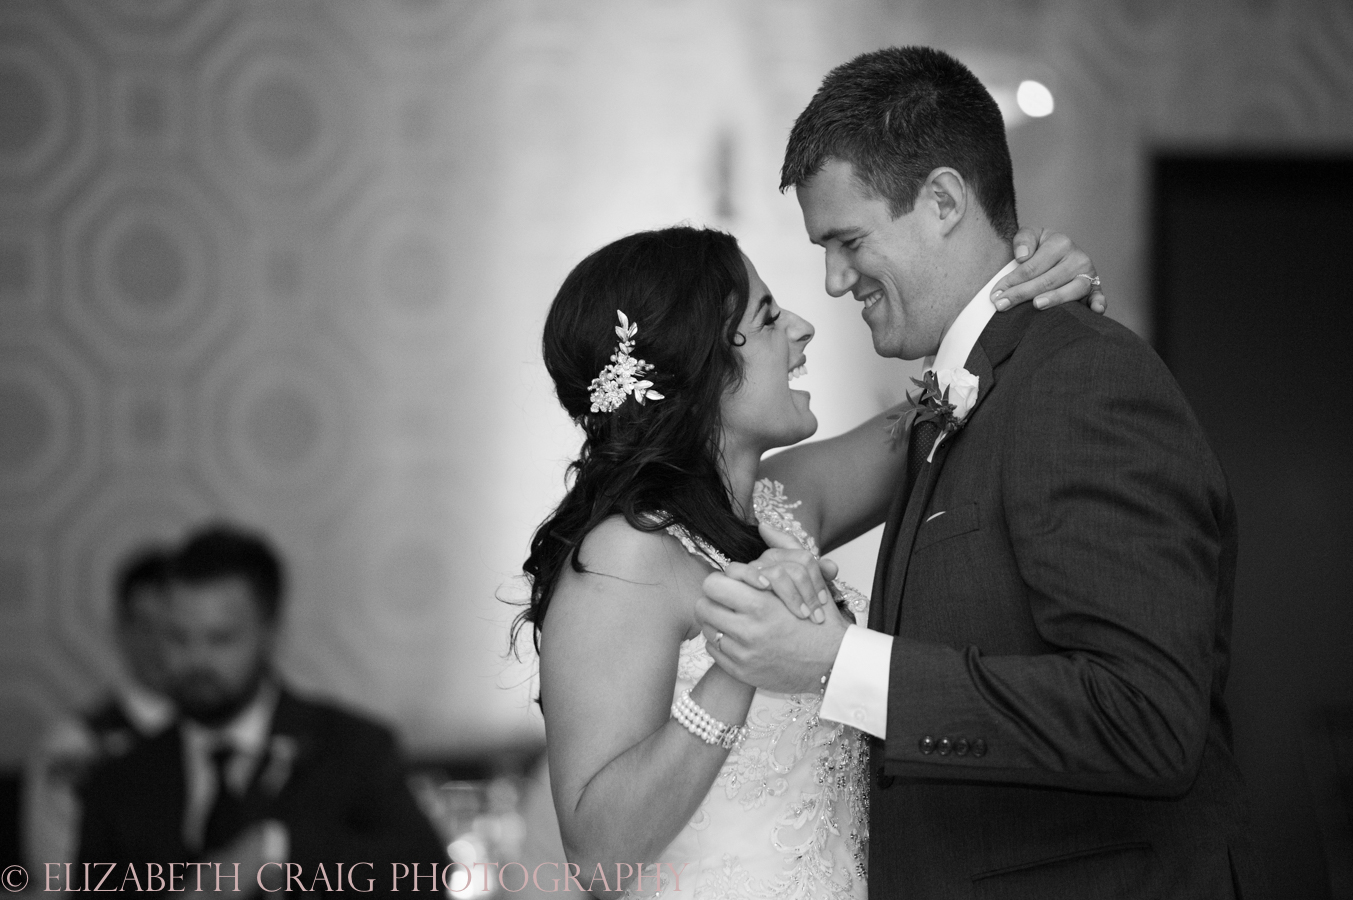 pittsburgh-greek-weddings-fairmont-weddings-receptions-elizabeth-craig-photohgraphy-022